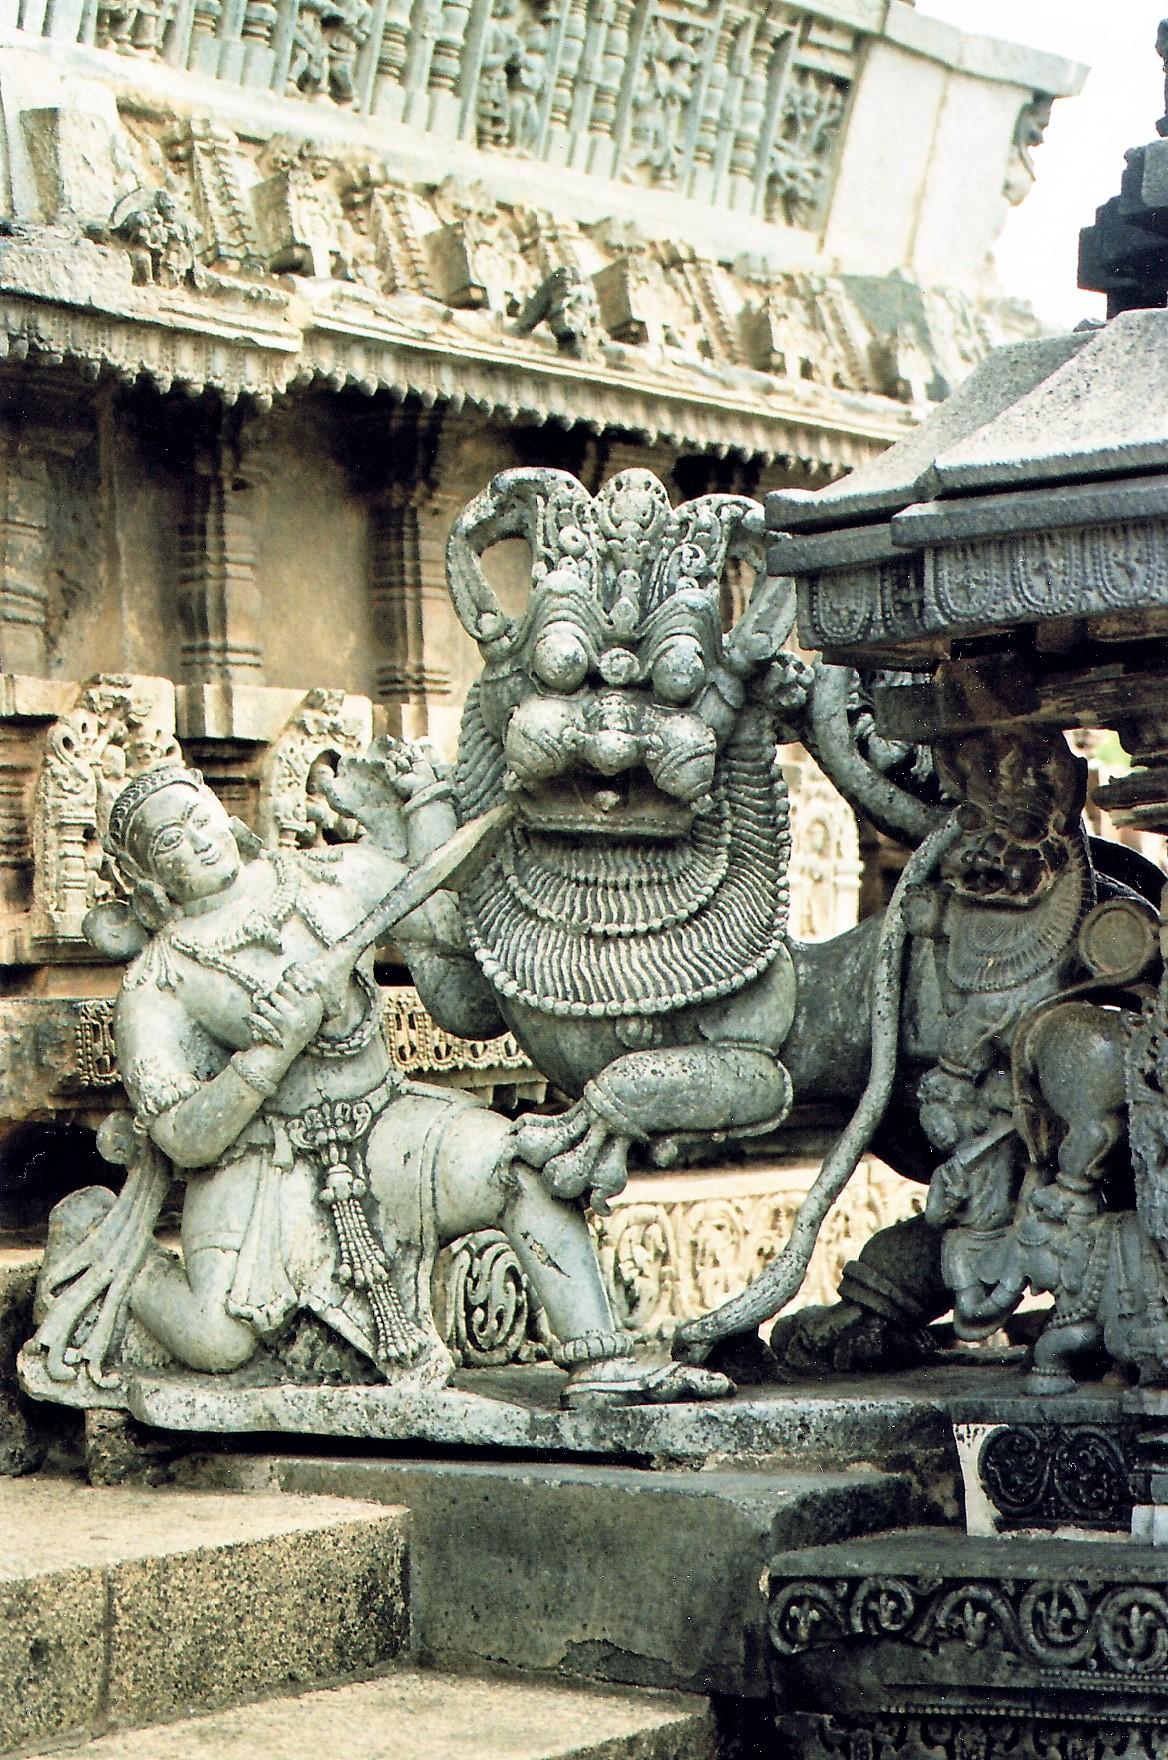 Chennakesava Temple in Belur, Karnataka, India.